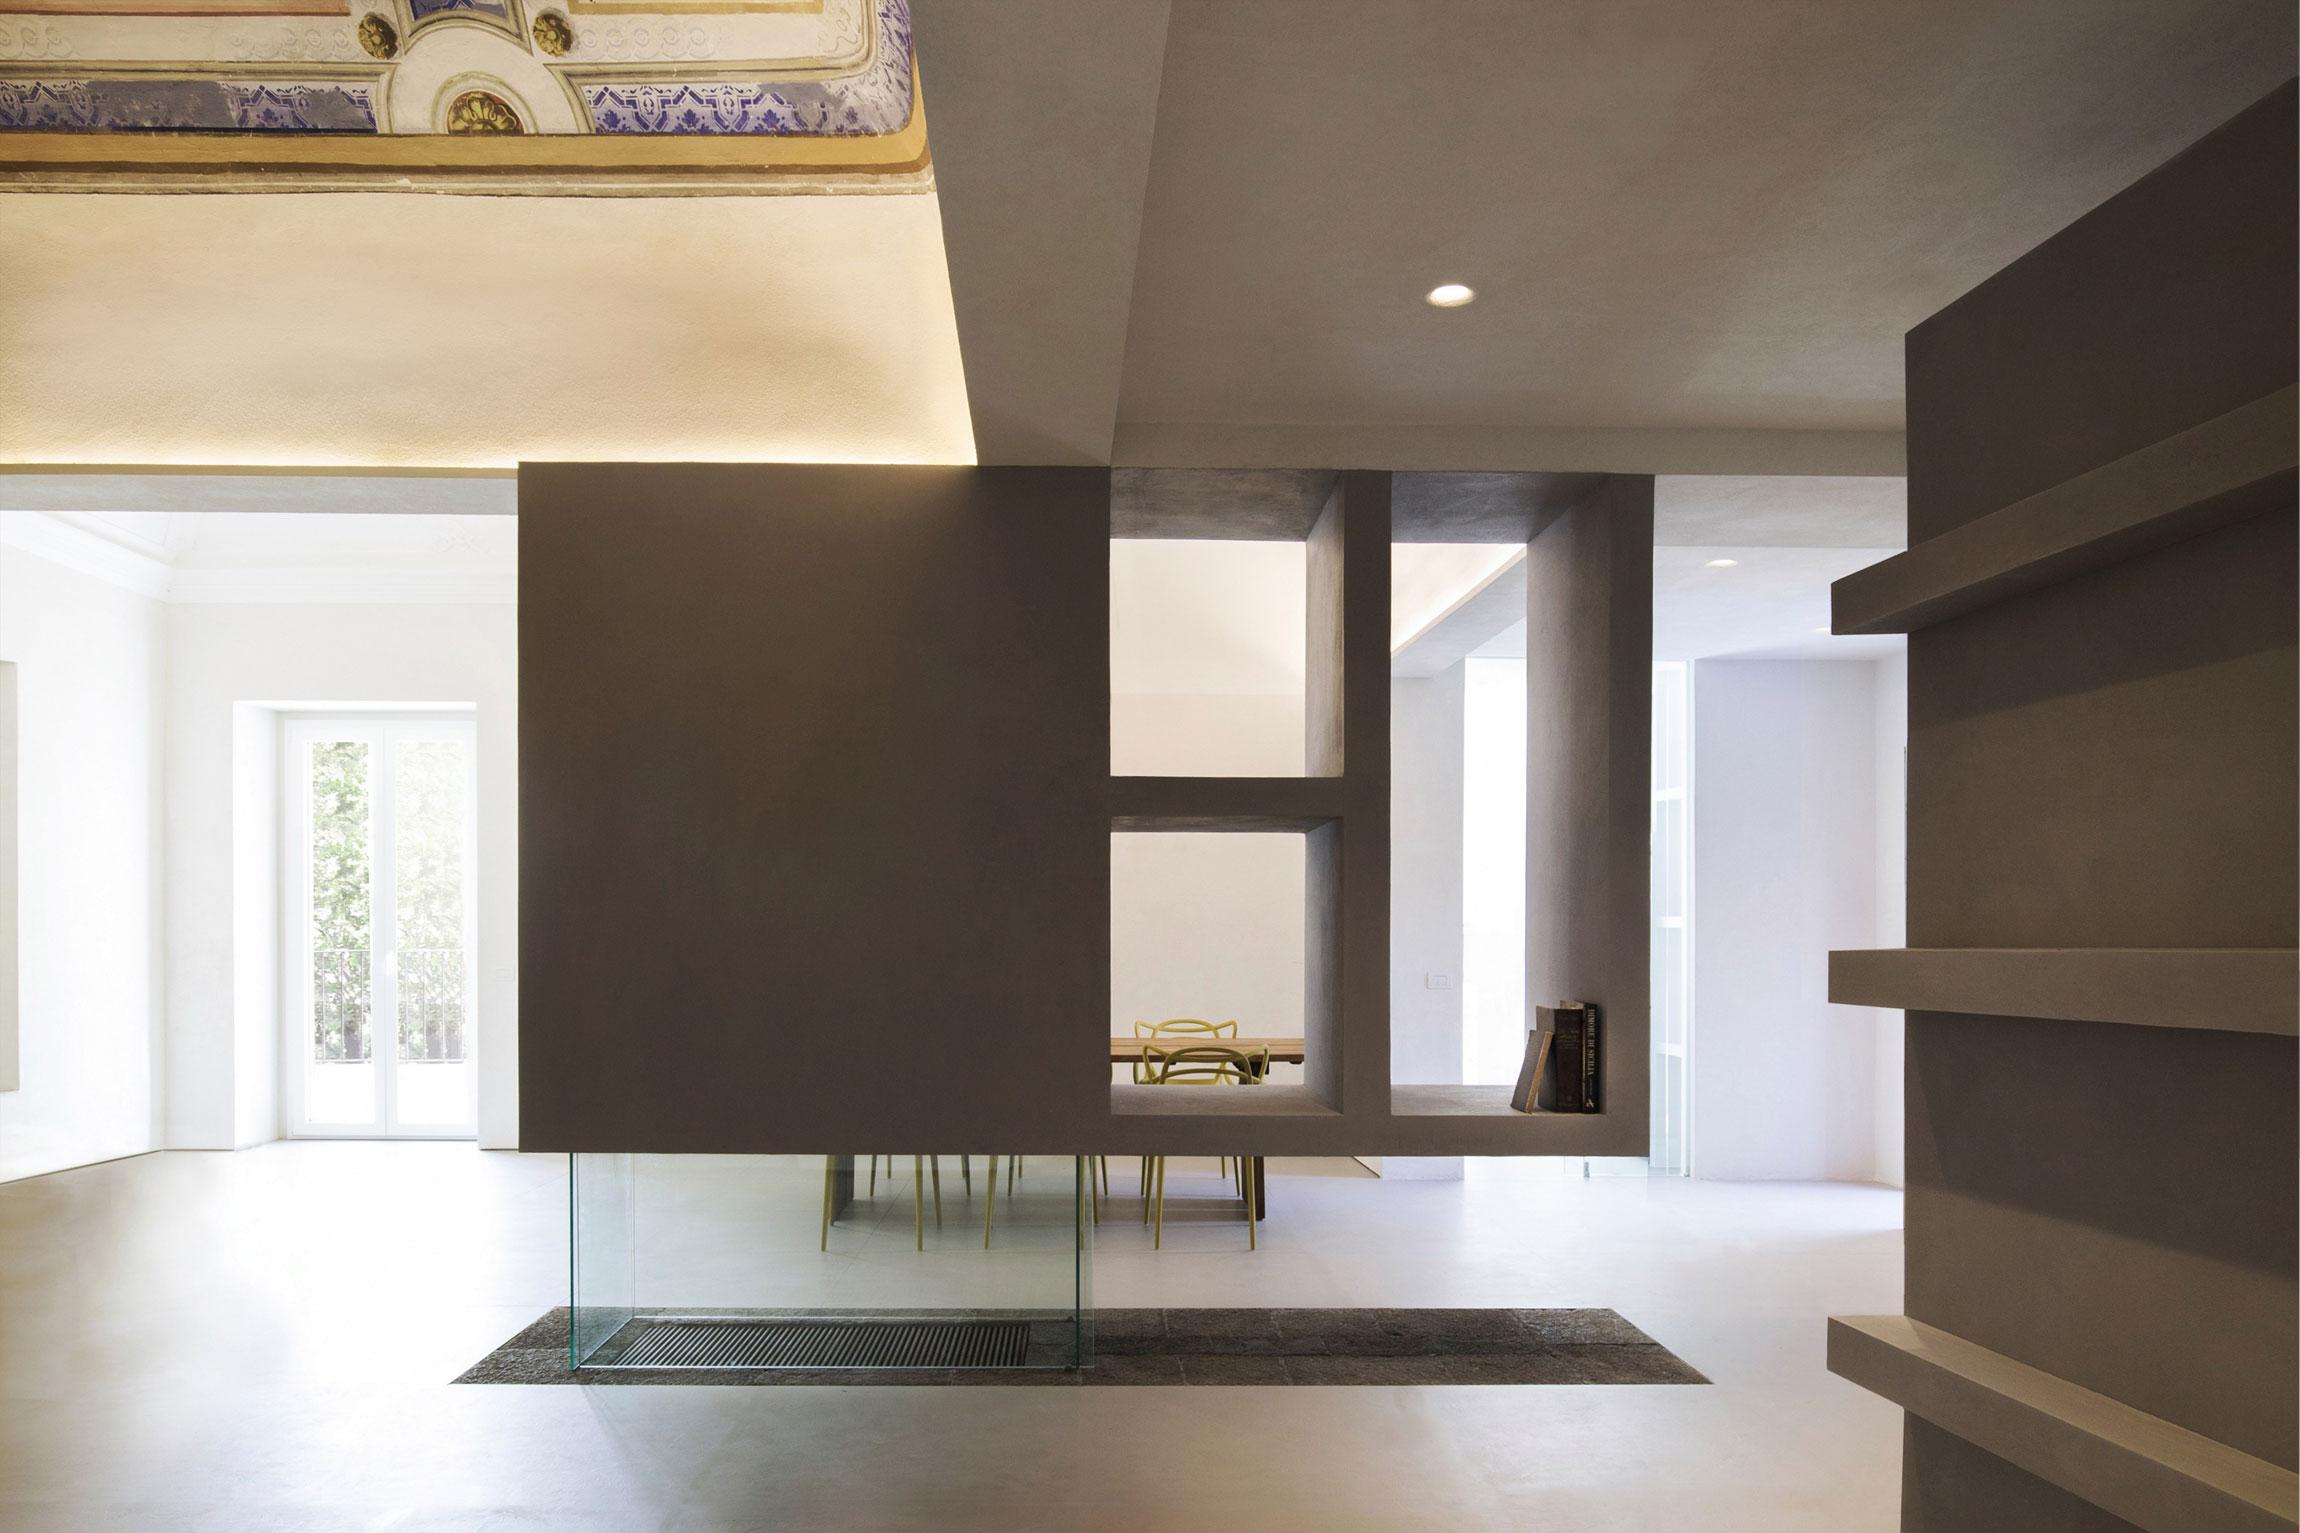 CRV House in Viagrande by ACA Amore Campione Architettura-22